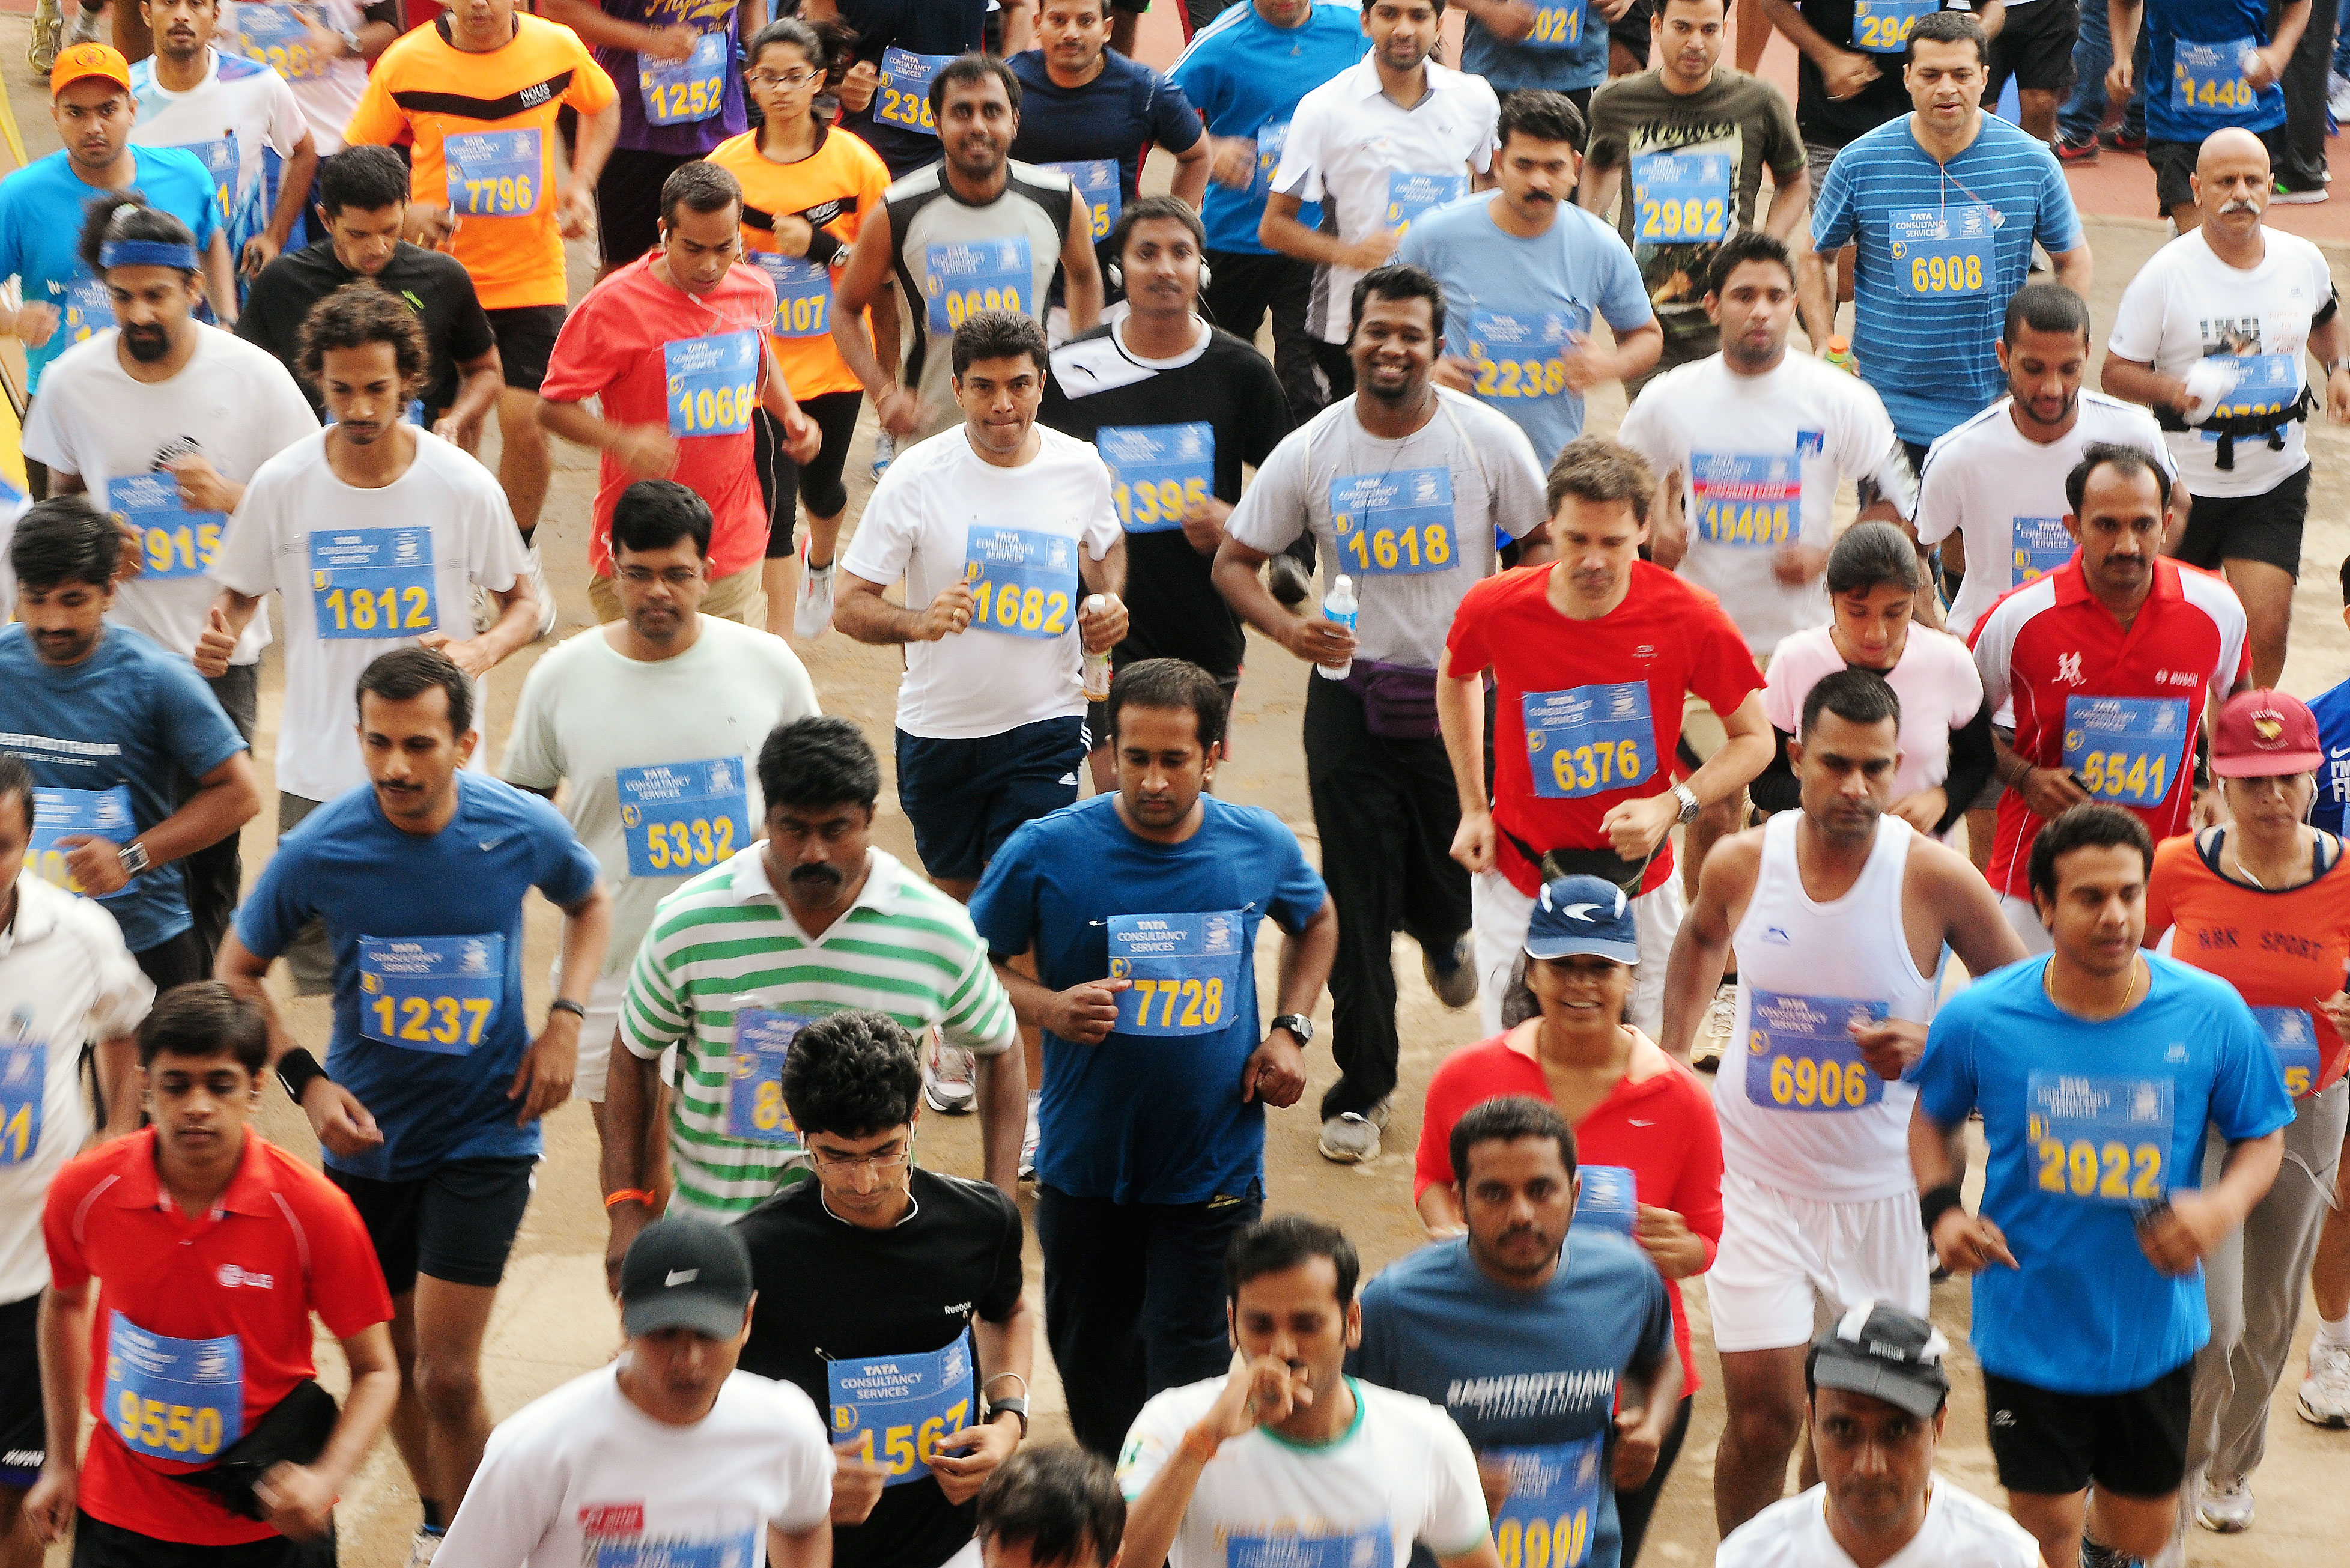 TCS World 10K run in Bangalore